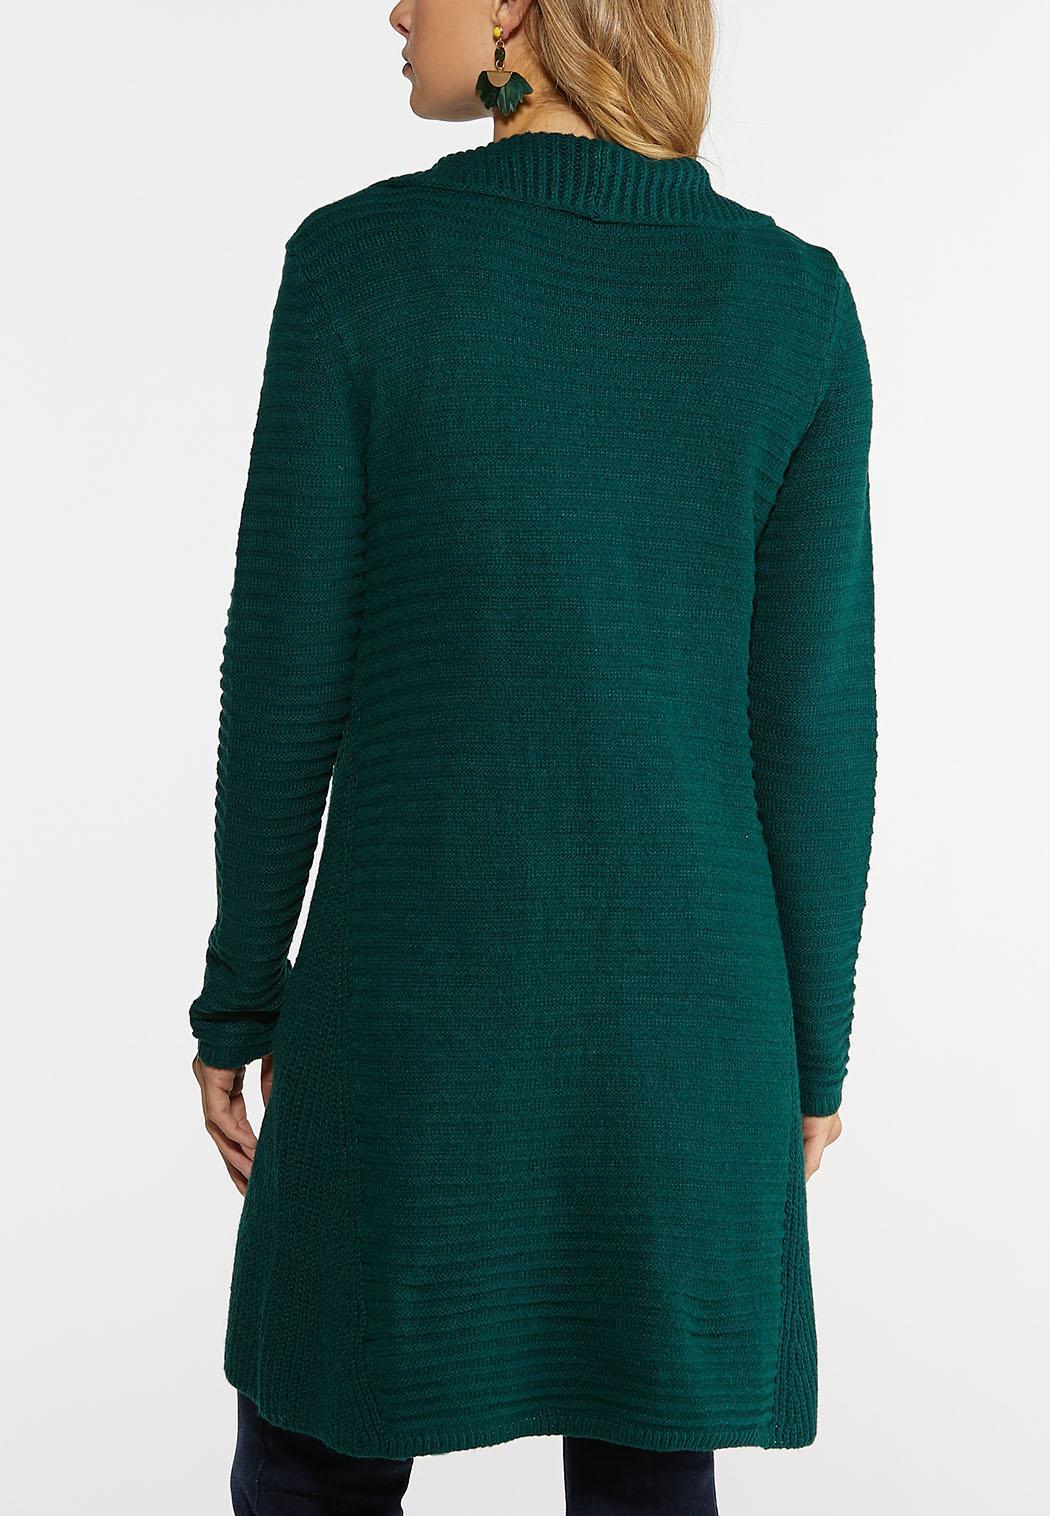 Knit Yarn Cardigan (Item #43992654)